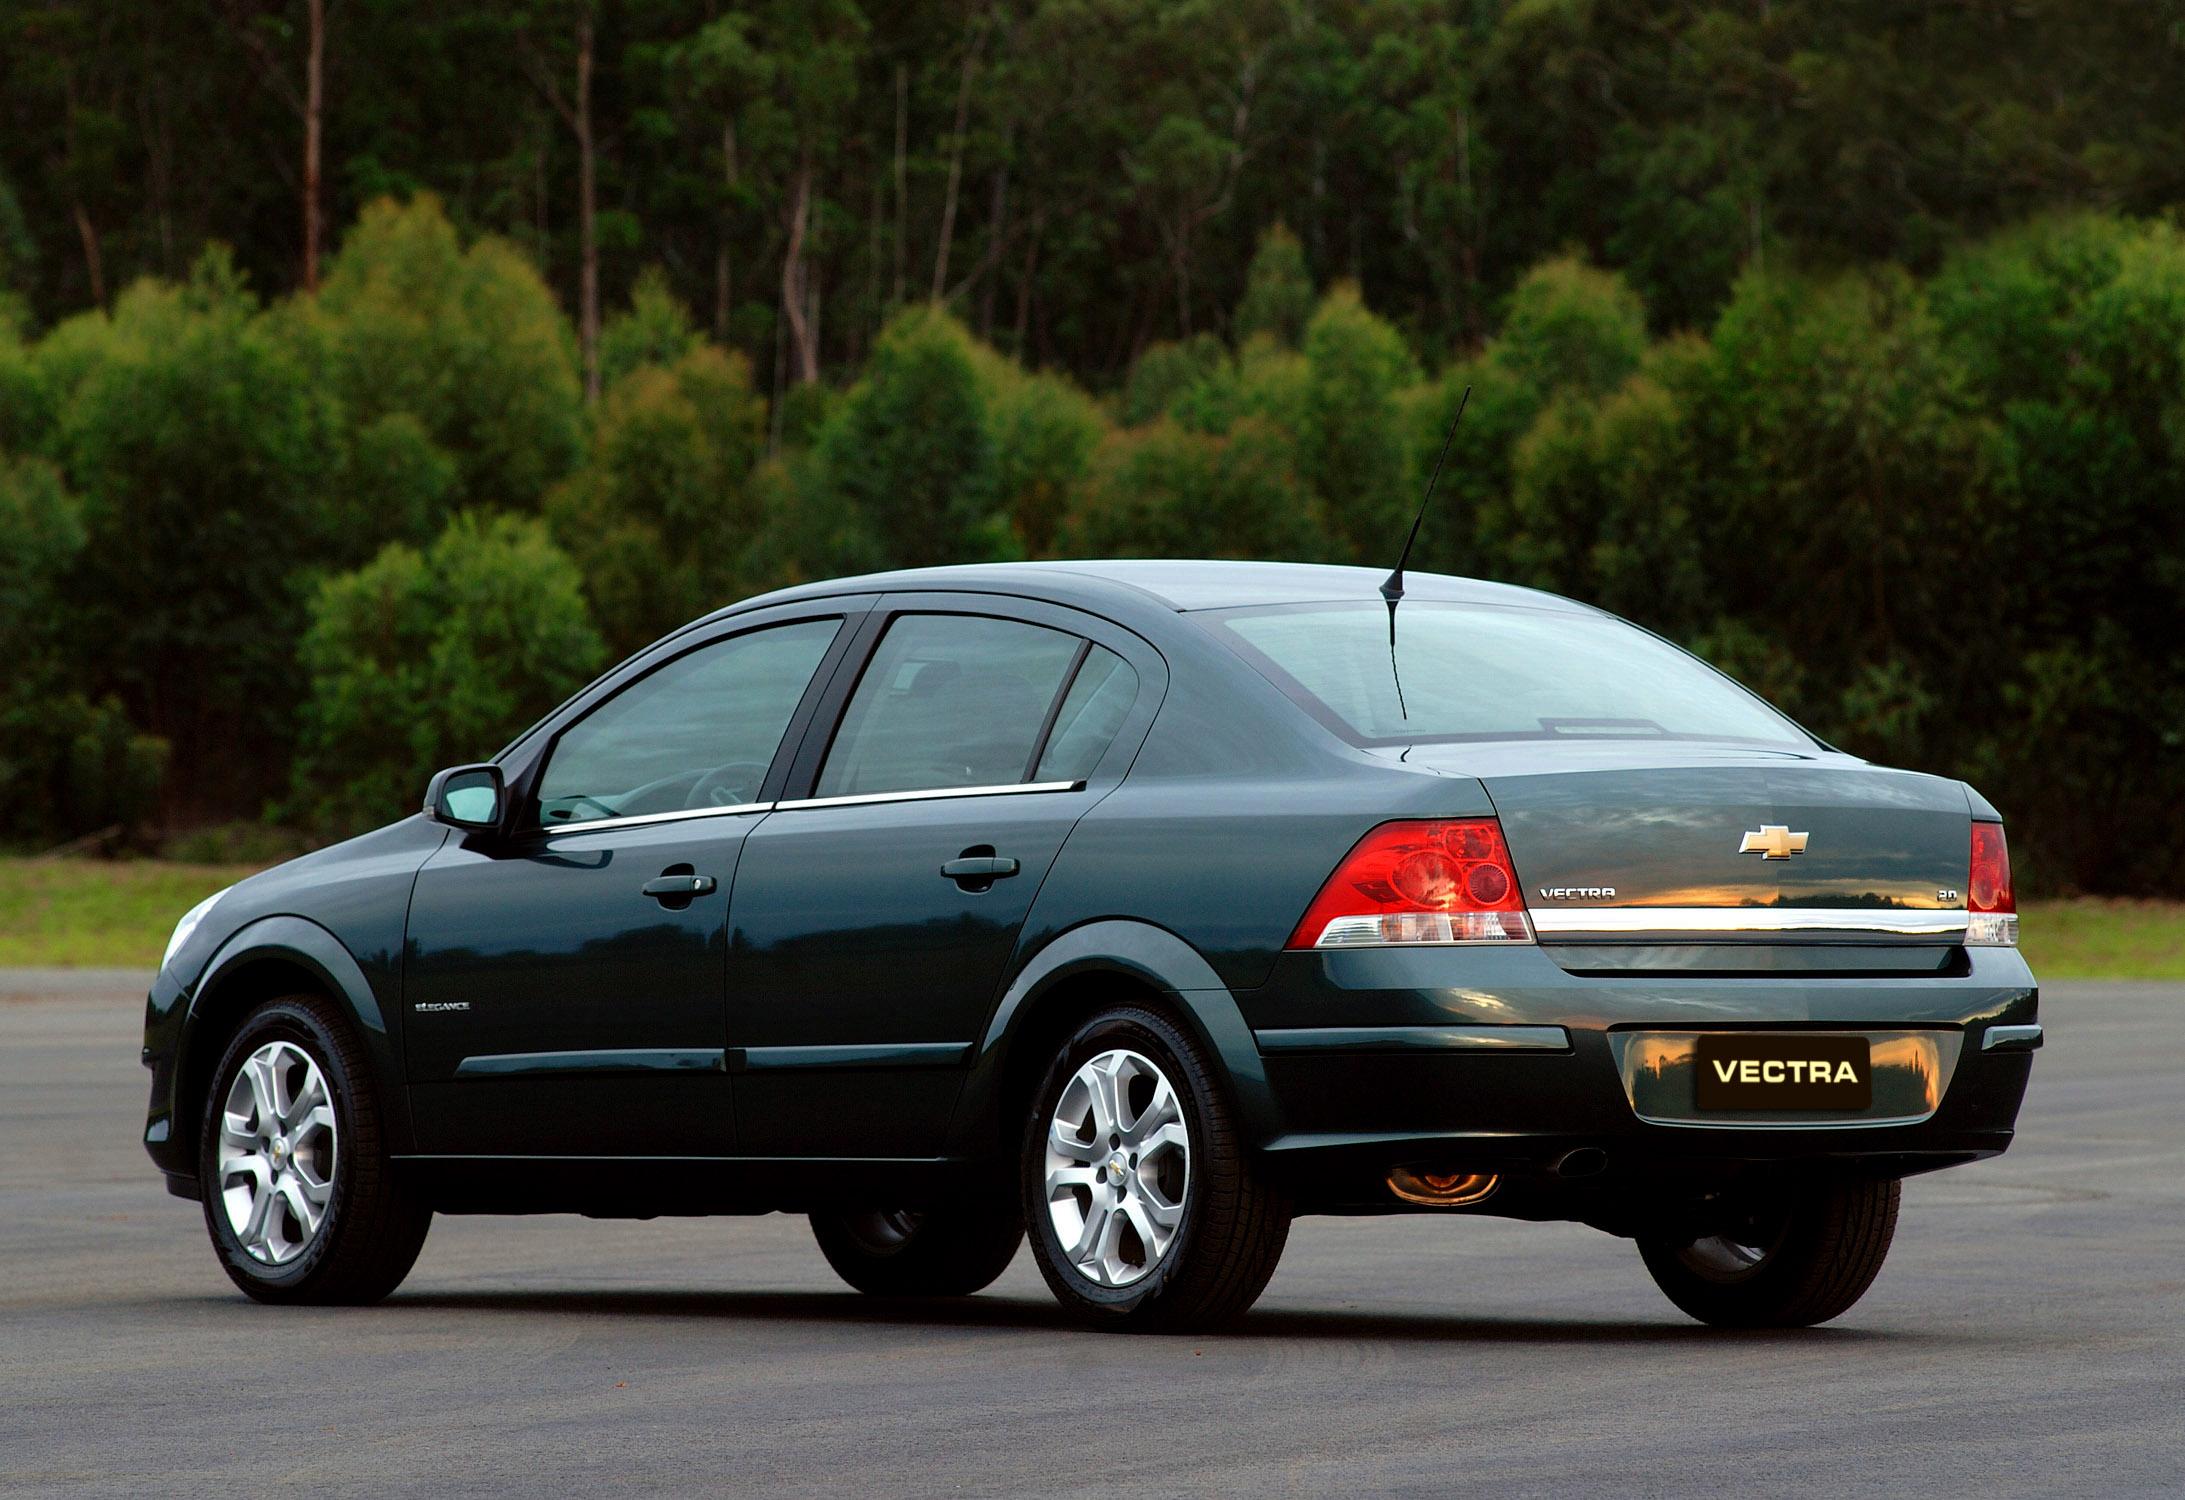 Chevrolet Vectra 2009 foto - 4